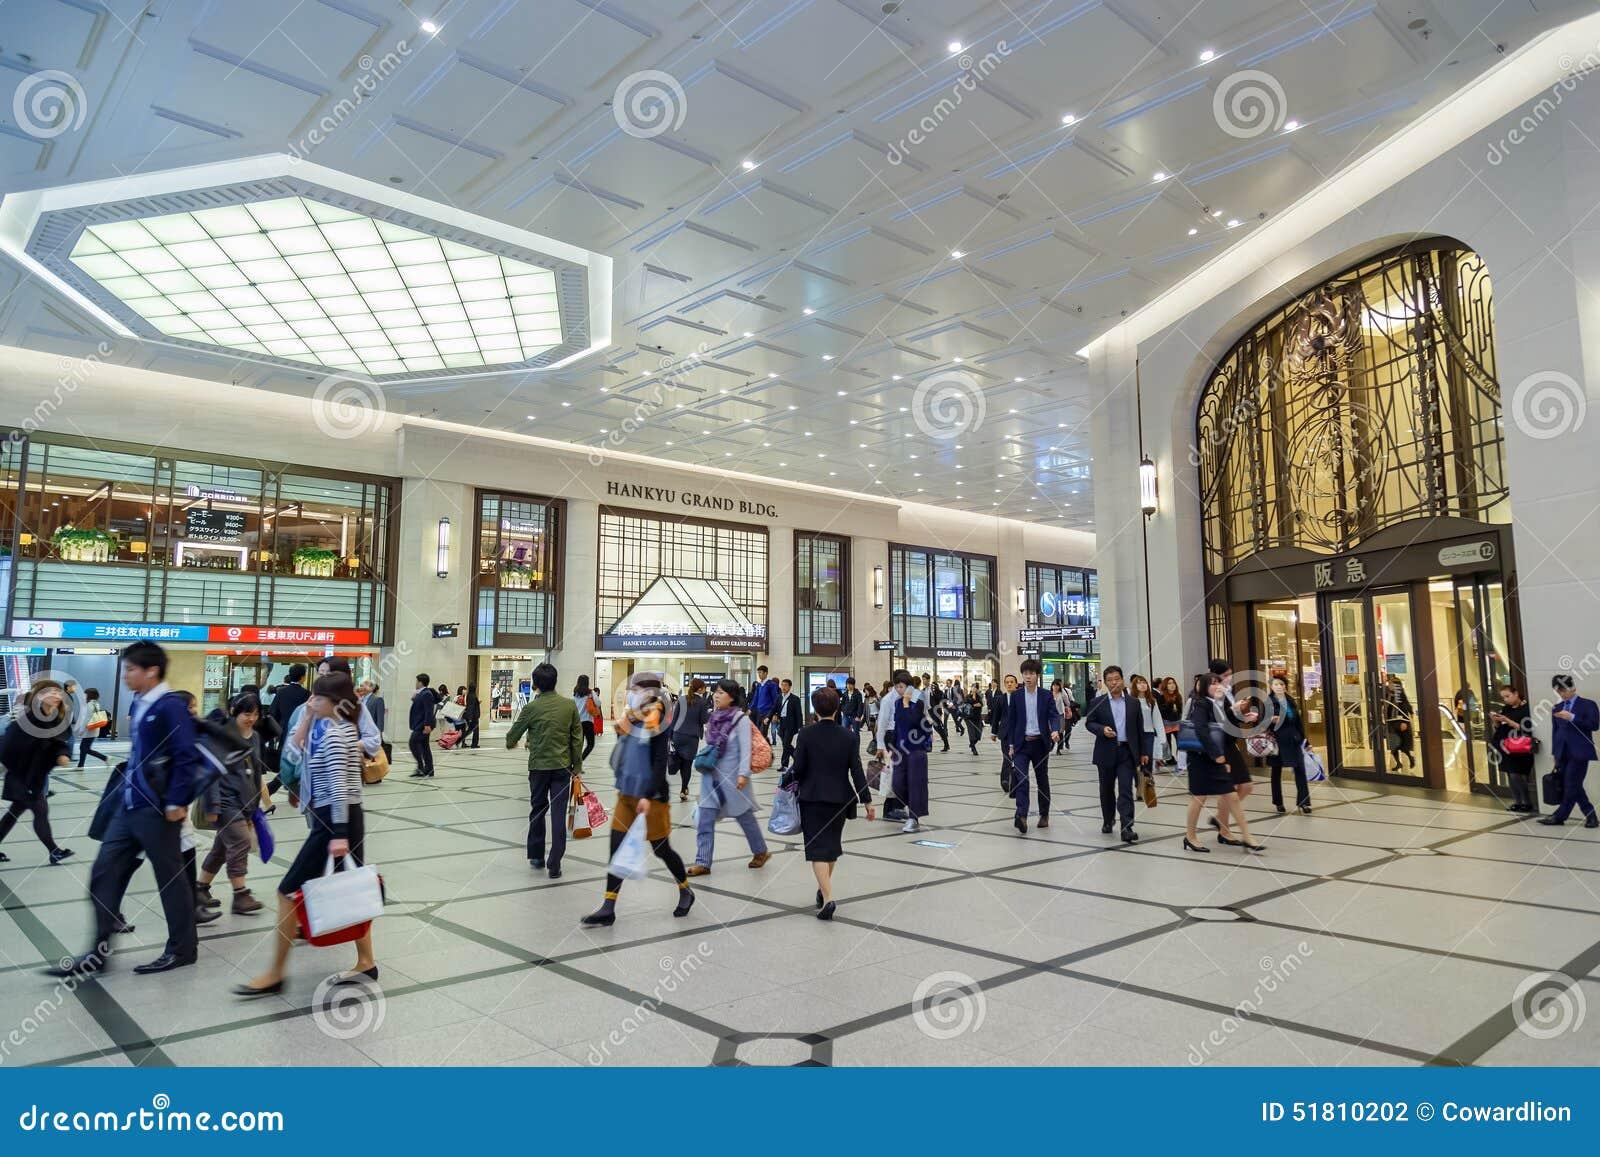 99edf10c4 The underground Umeda terminal of Hanshin Electric Railway is located south  of Osaka Station, next to underground of Hanshin Department Store